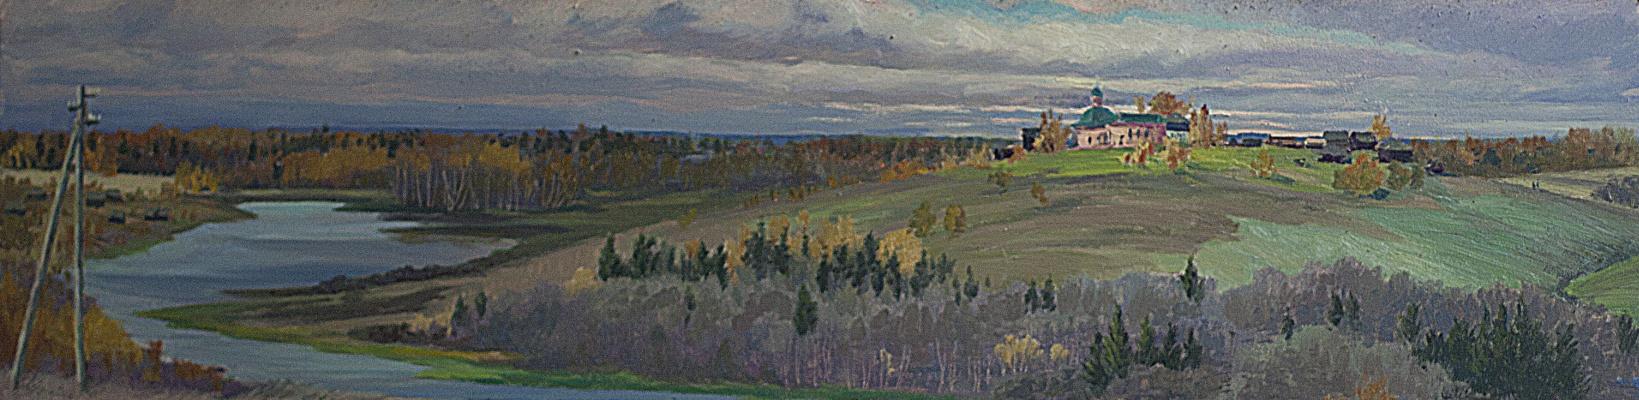 "Vera Ivanovna Filippova. Autumn transformation. Spasskoe. The Church of the Transfiguration (from the series ""Rubtsovsky Autumn""). K., M., 32х123, 2014"